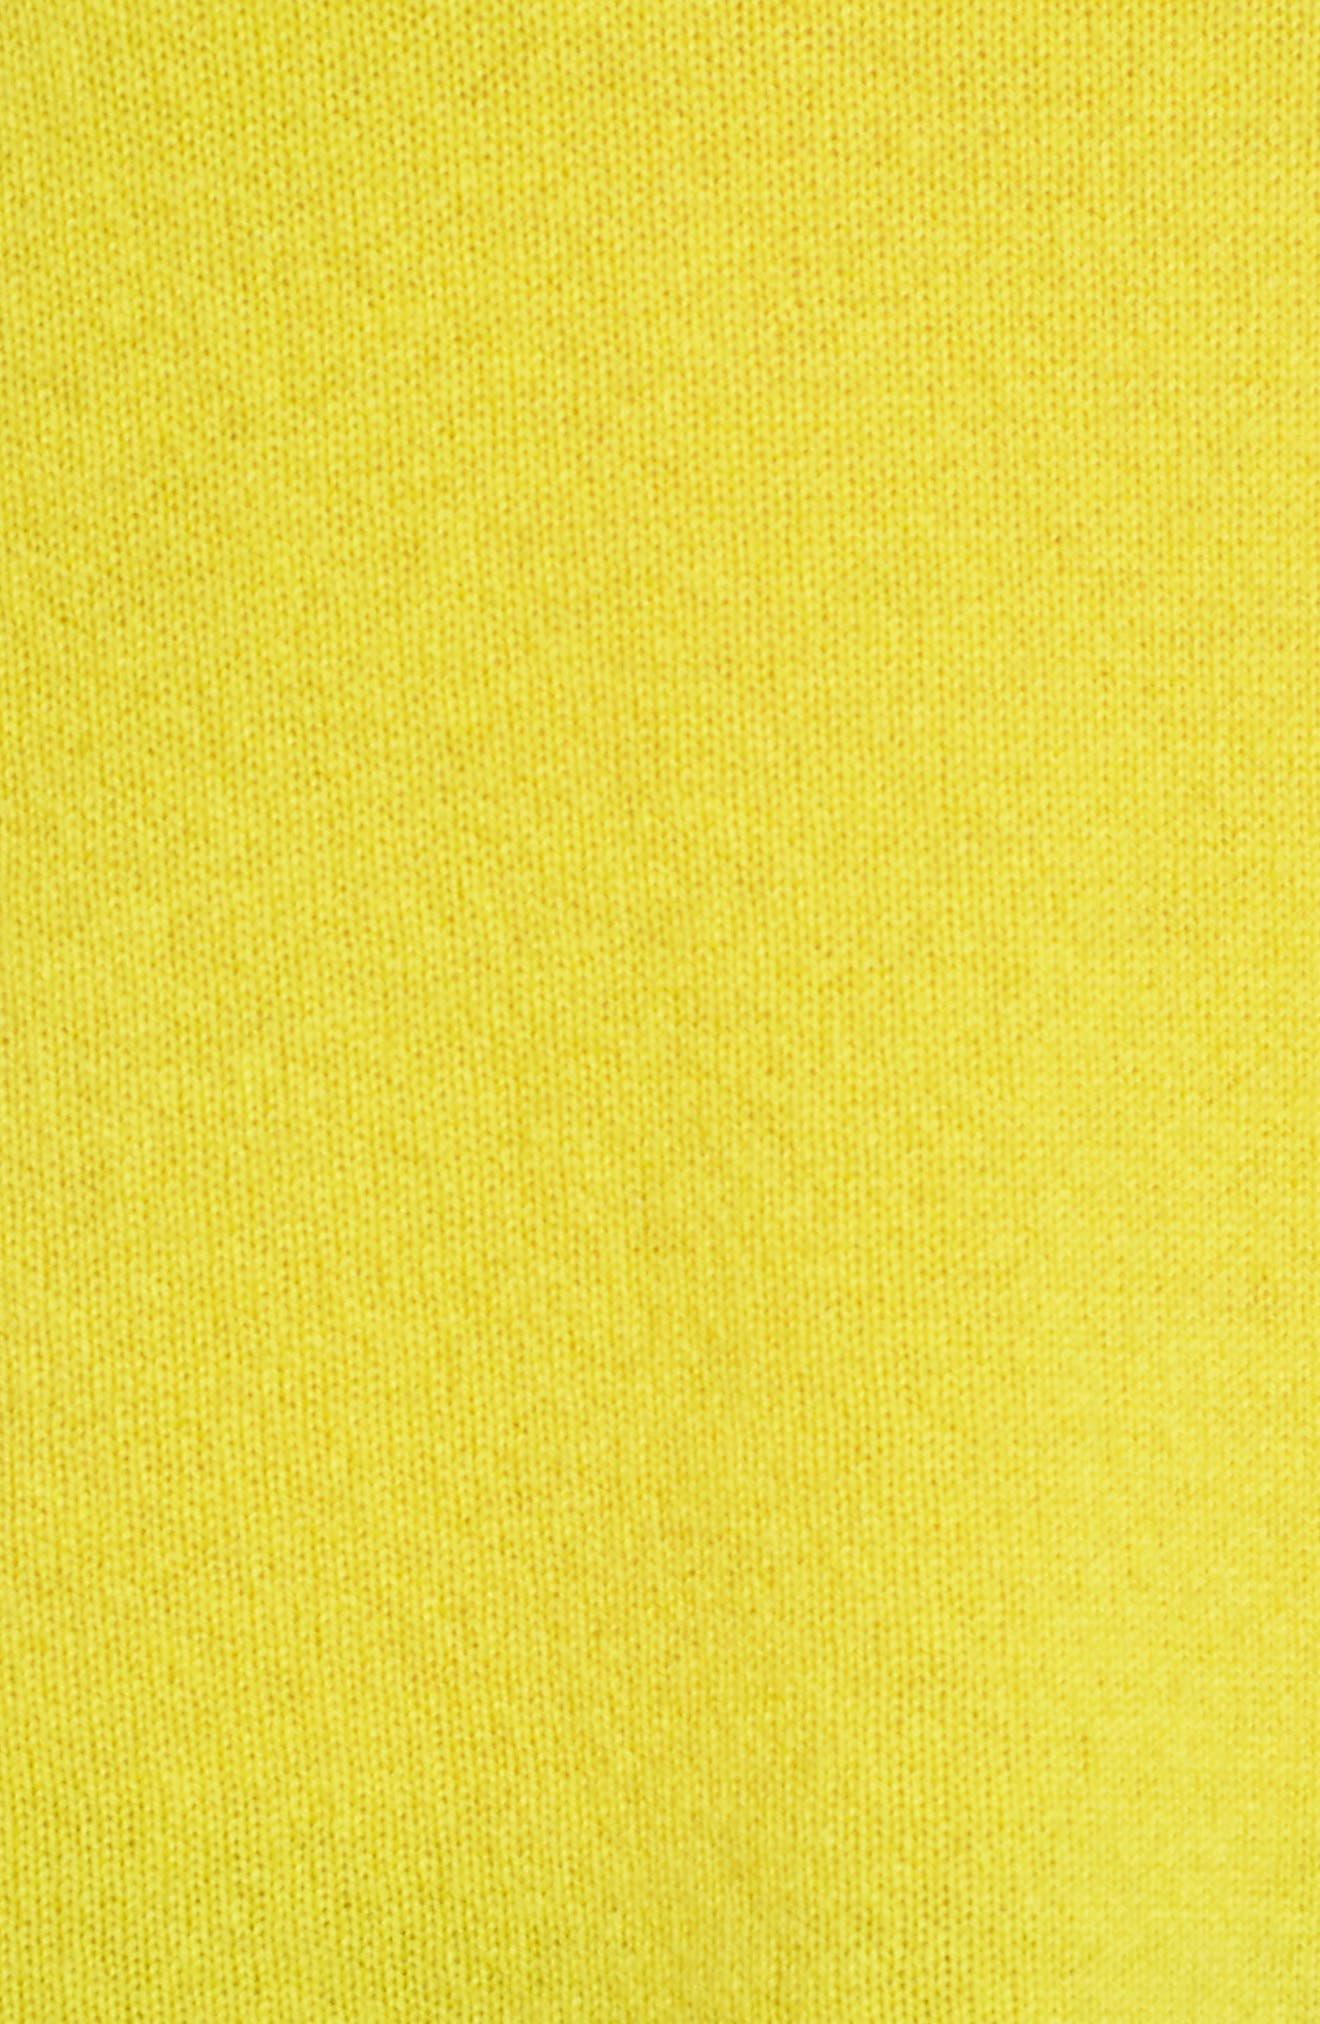 Crewneck Cashmere Sweater,                             Alternate thumbnail 6, color,                             Blazing Buttercup